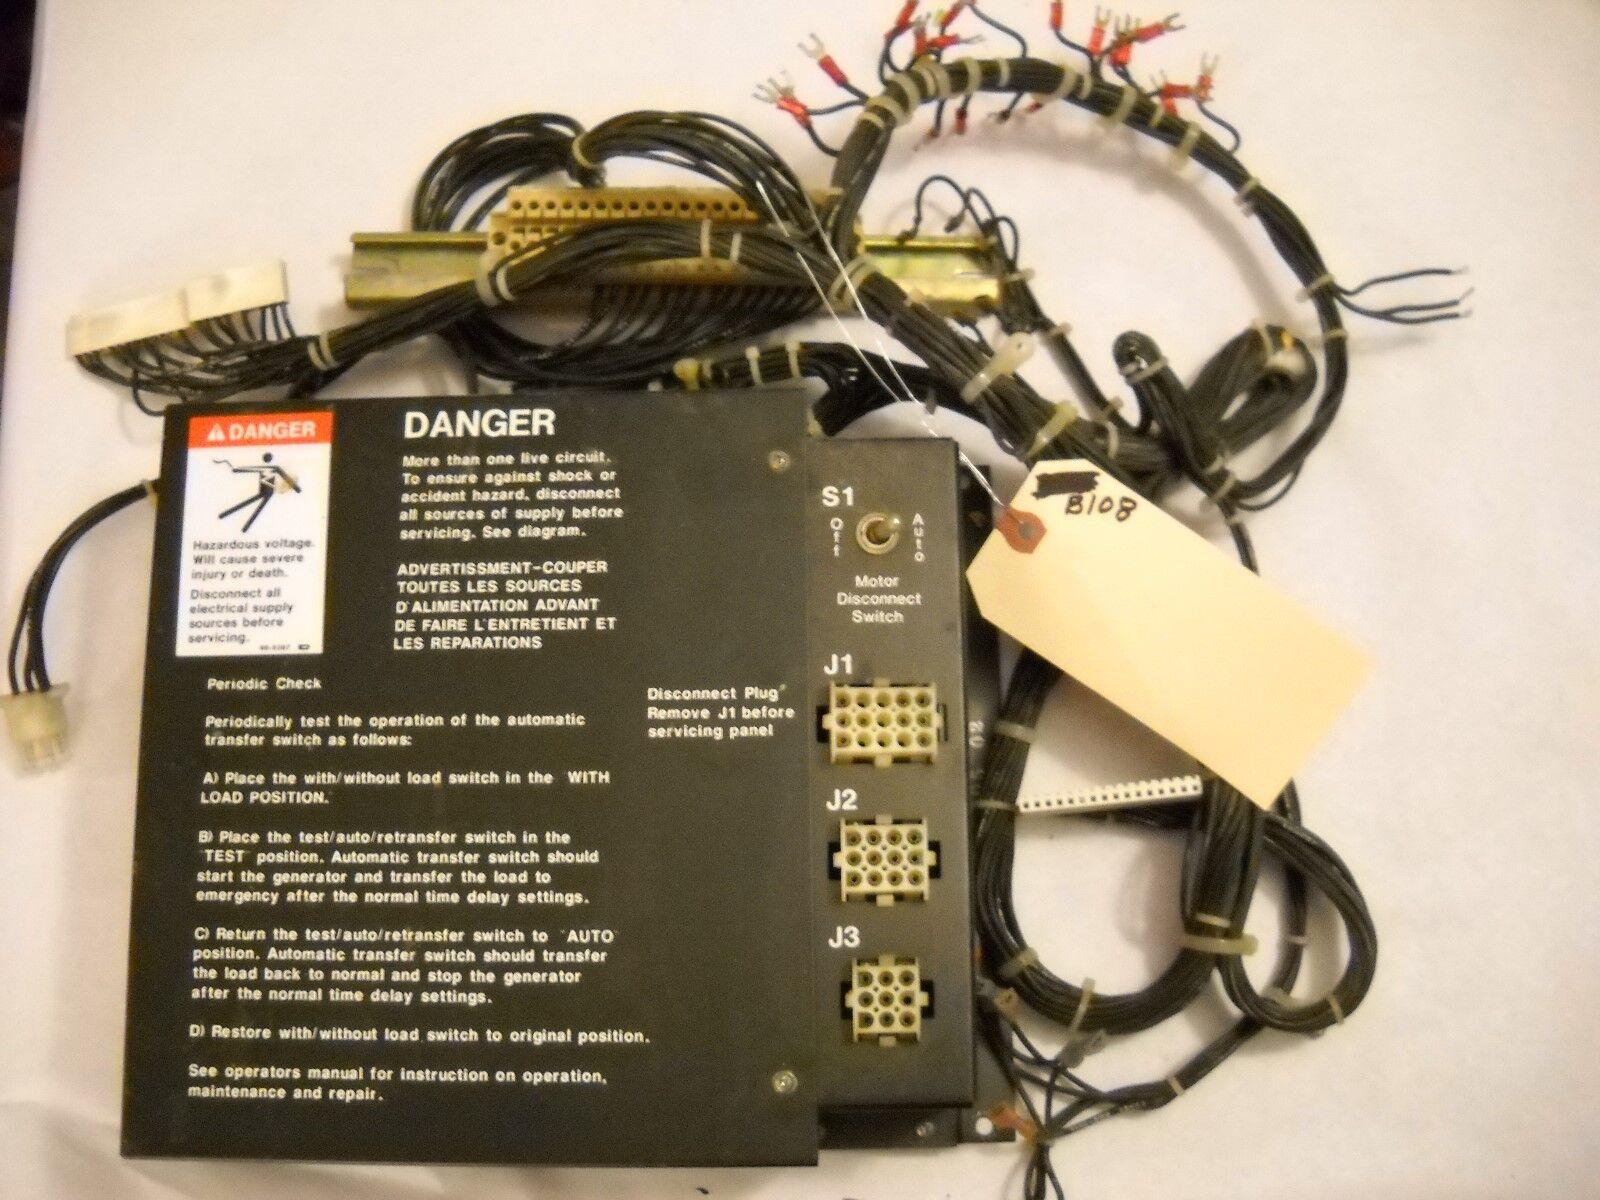 B108 Cummins Onan Oncu 300g 562g Transfer Switch Inner Panel With Emergen Wiring Diagram Norton Secured Powered By Verisign